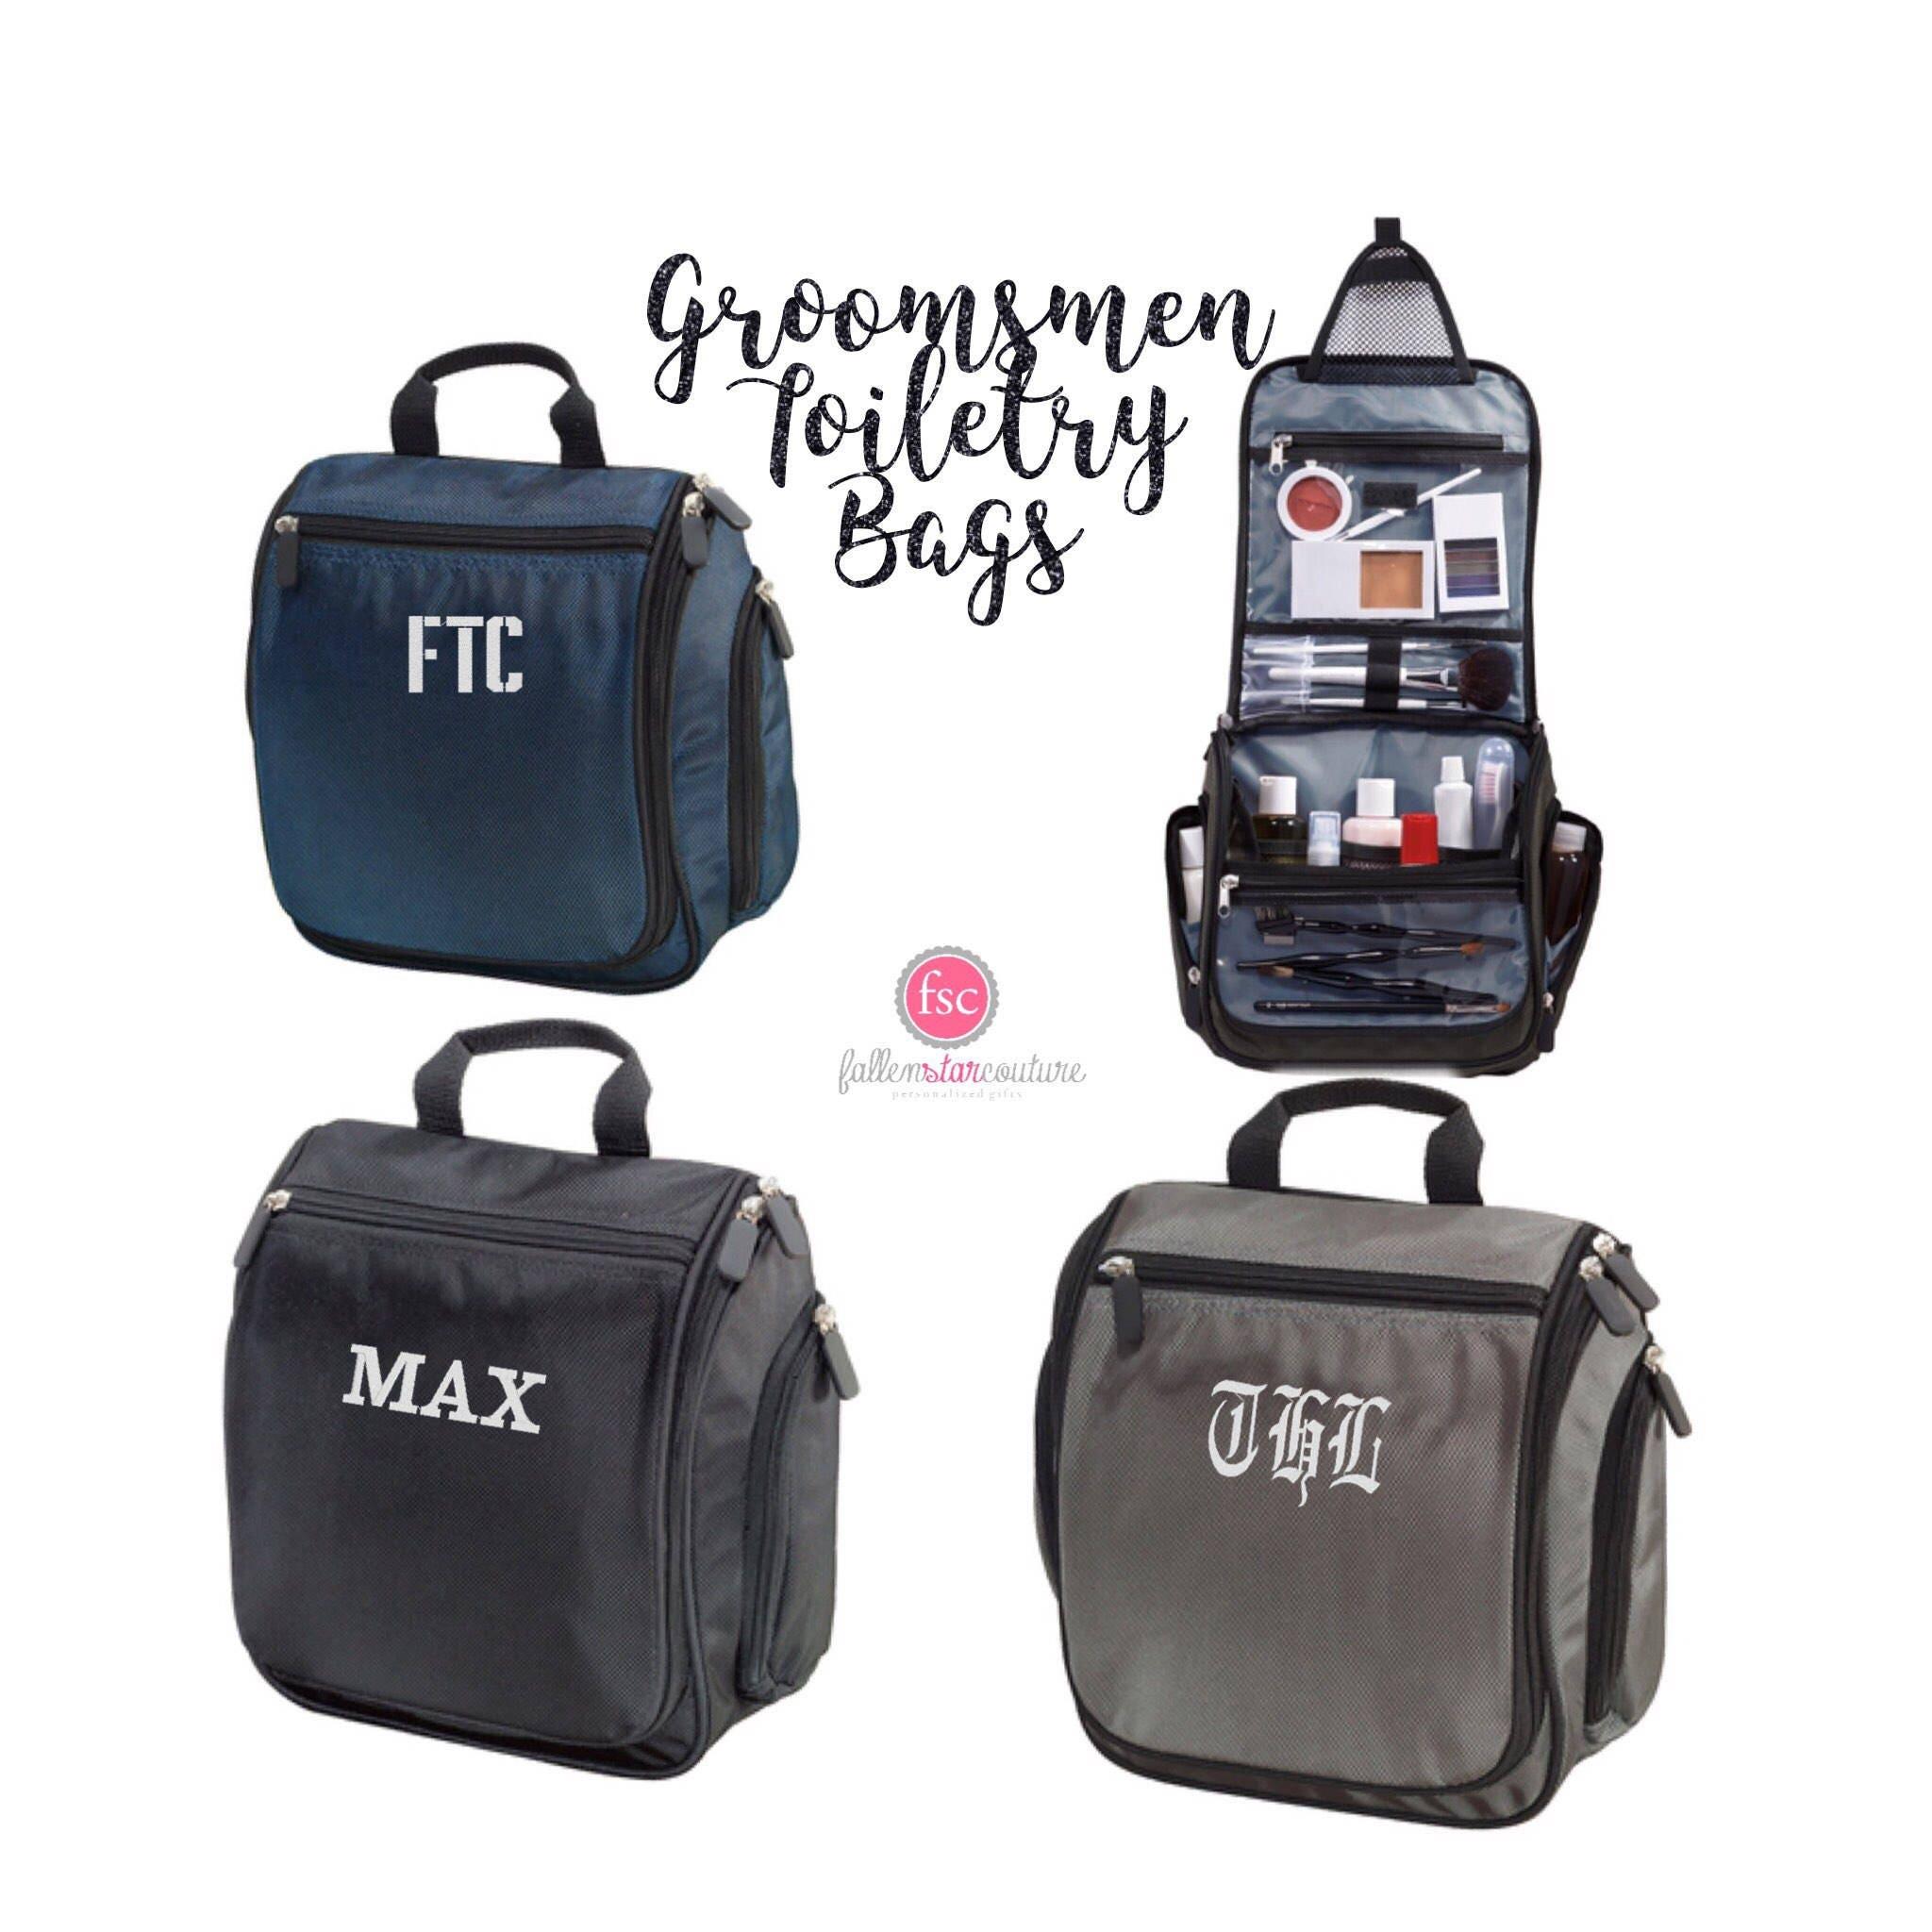 44167dbc4d03 groomsman gifts